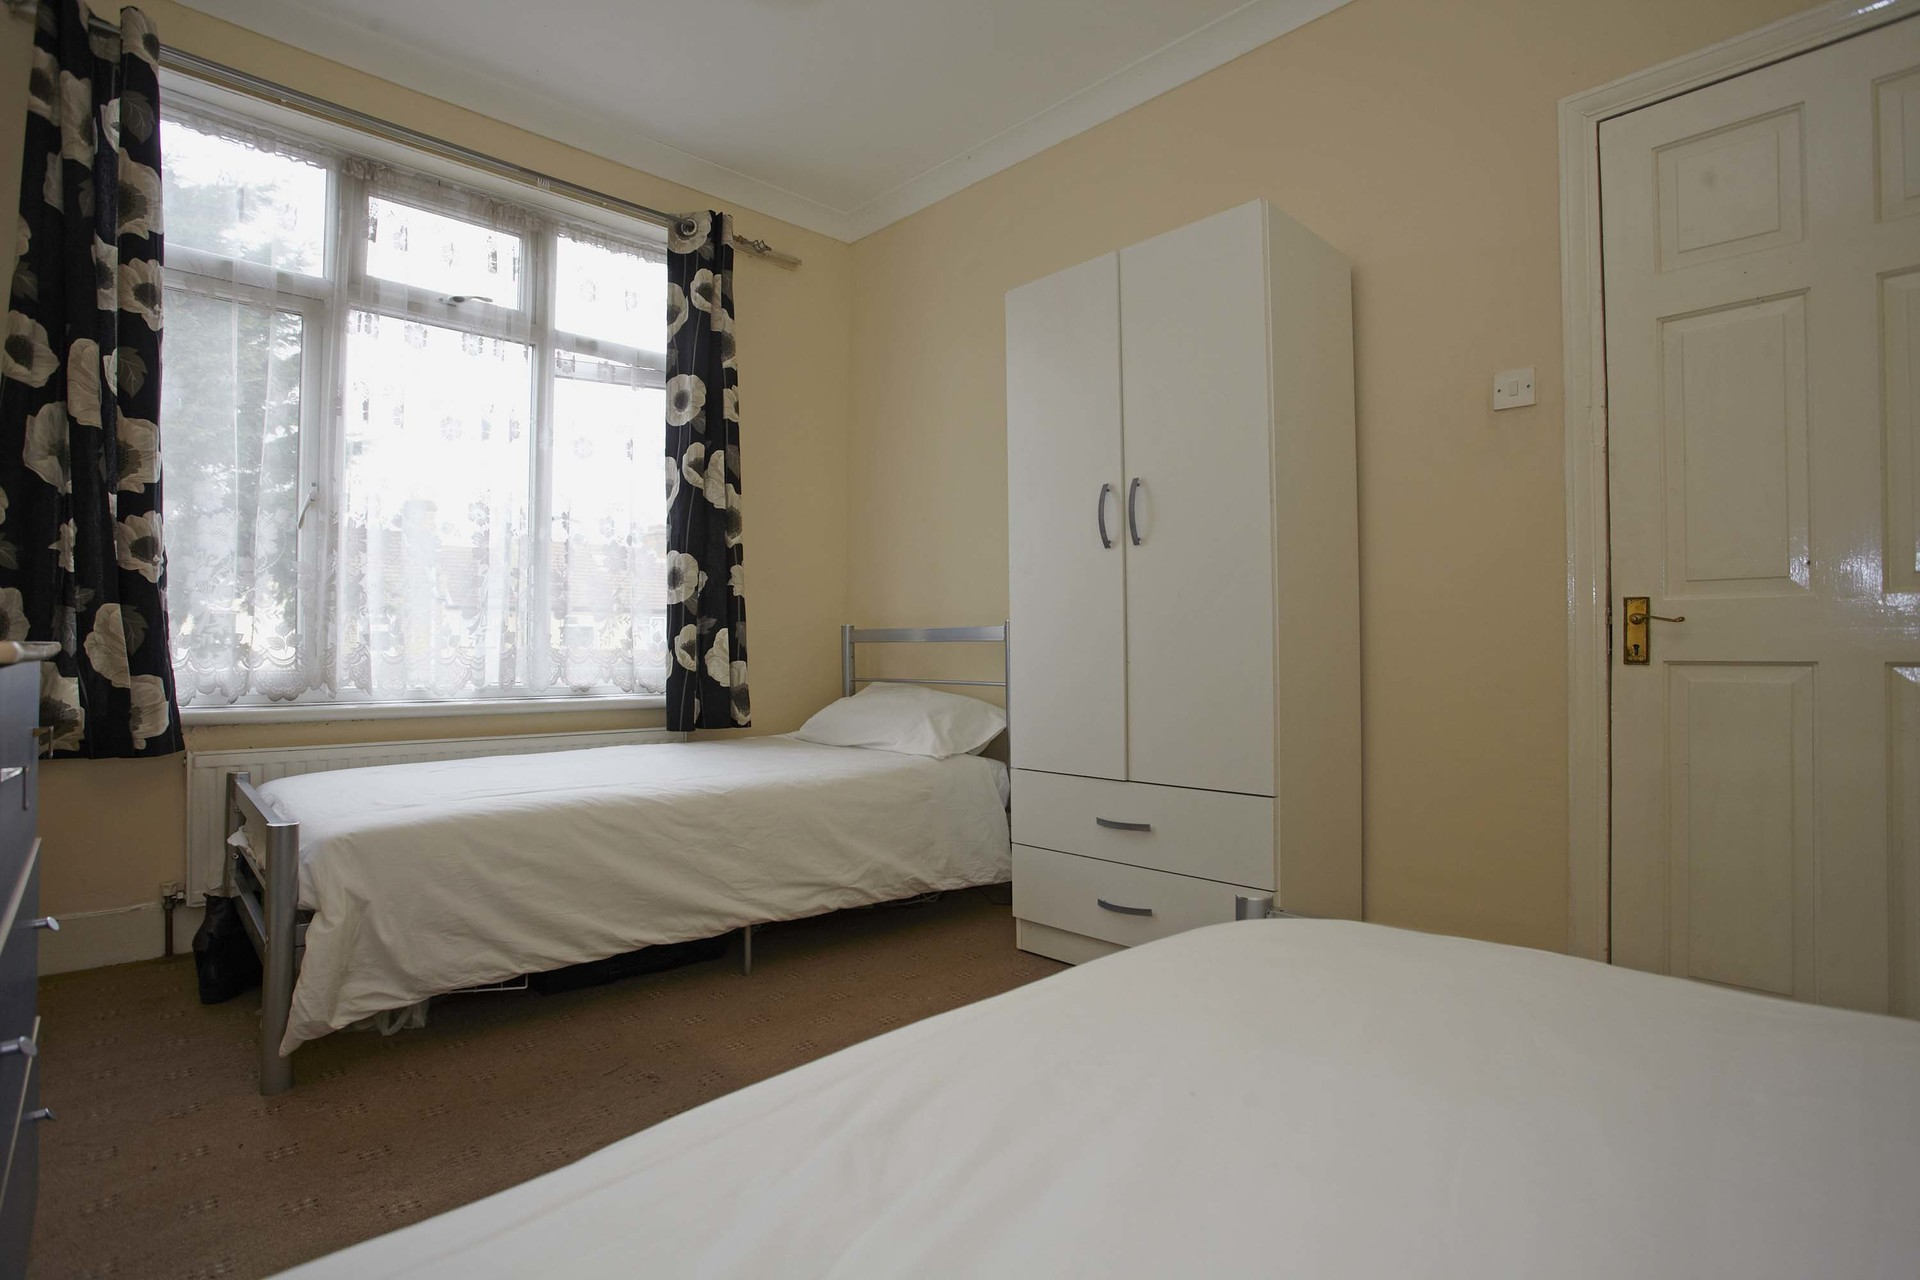 110-amazing-twin-room-in-london-770d595181eb7296f90da5013c3adbd0